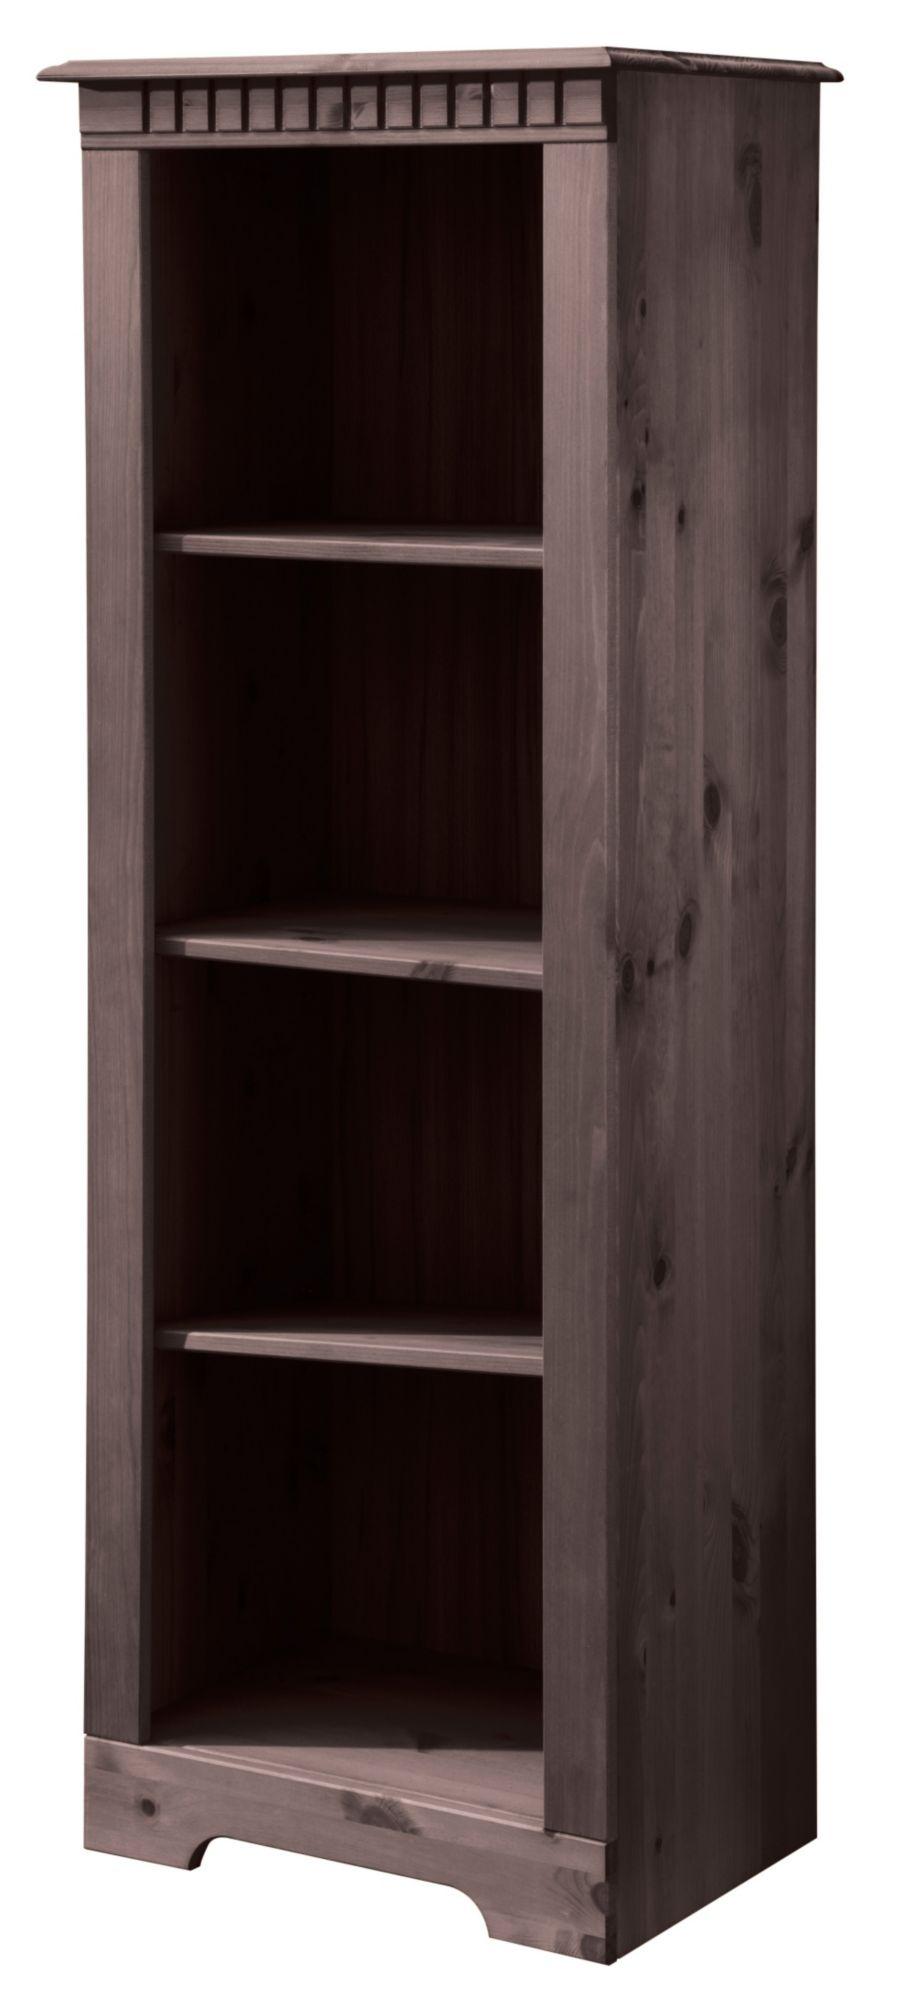 regal home affaire breite 50 cm h he 135 cm. Black Bedroom Furniture Sets. Home Design Ideas